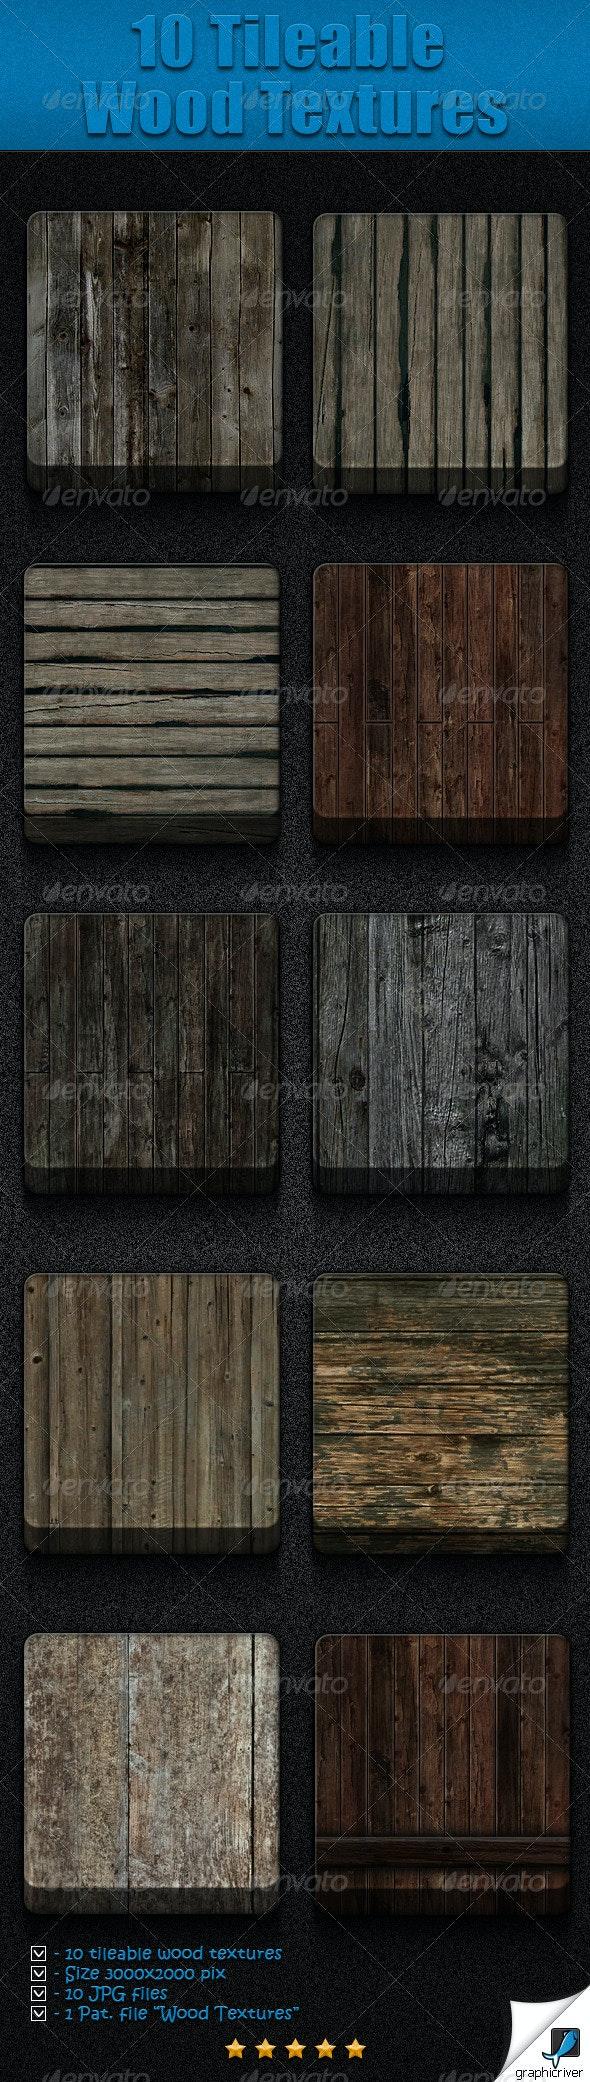 10 Tileable Wood Textures - Wood Textures